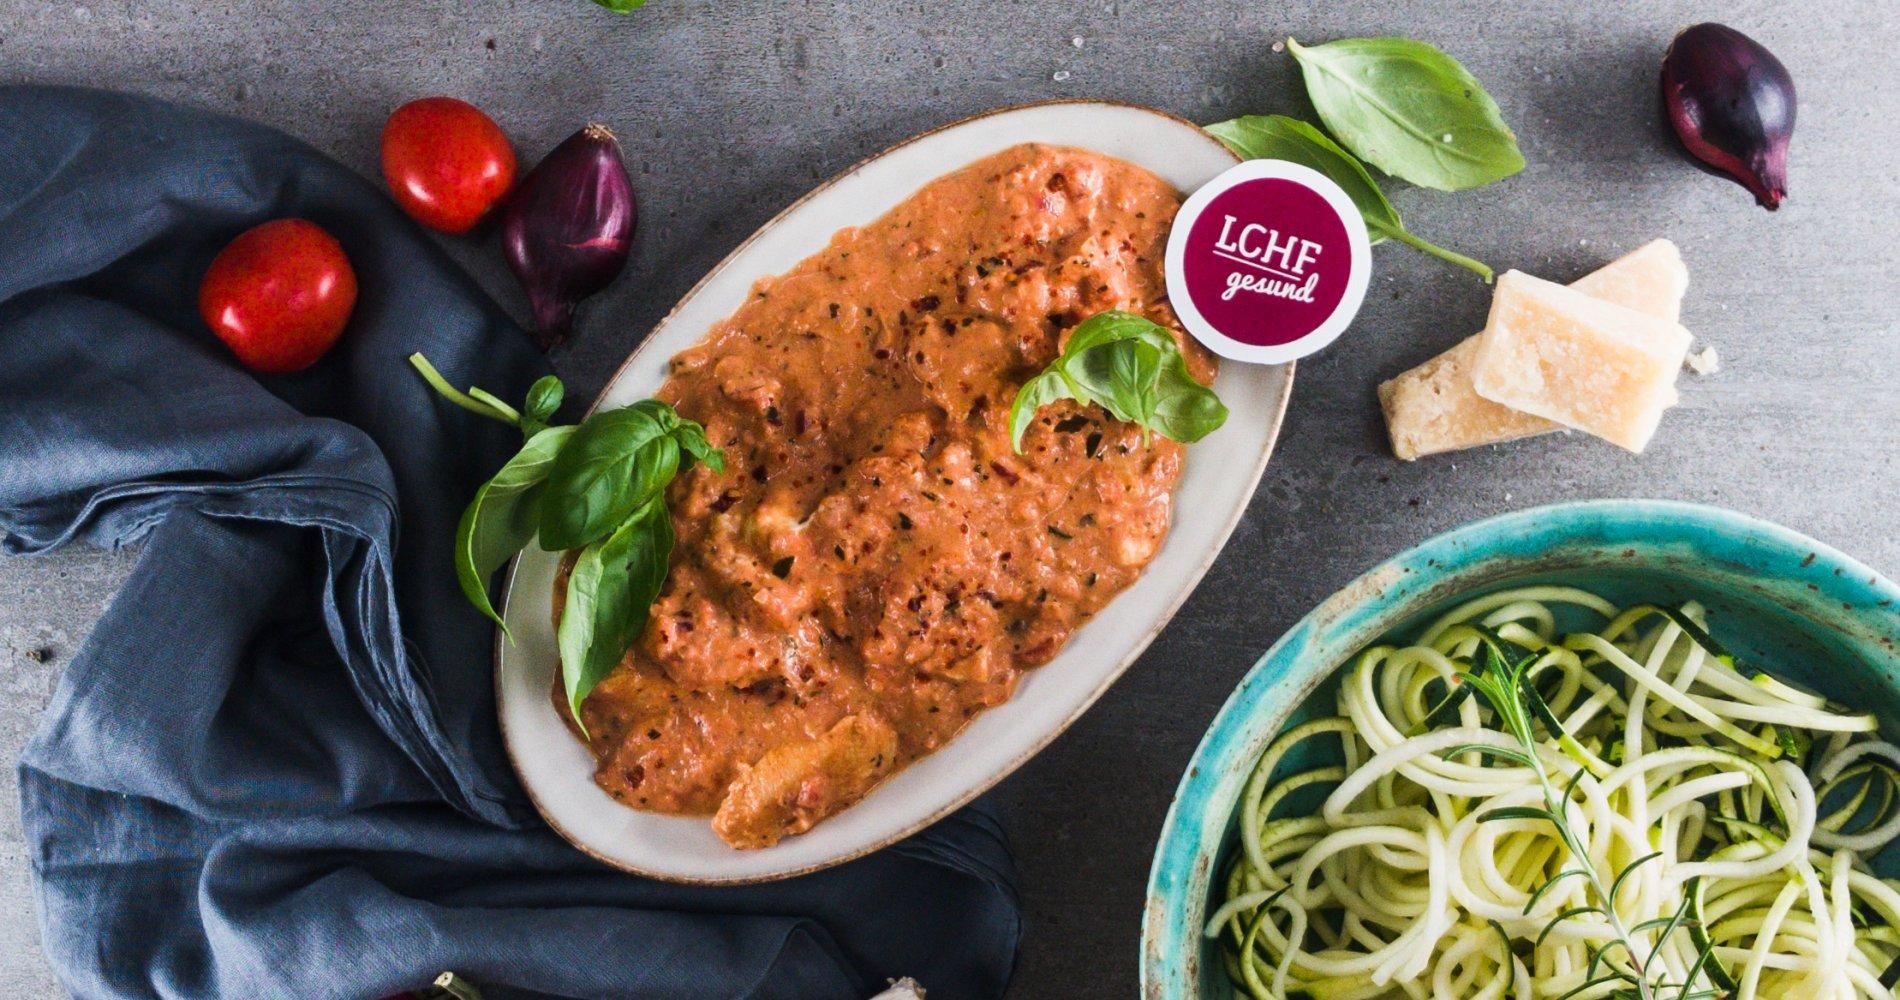 Rezept Low Carb: Tomaten-Mascarpone-Hühnchen - LCHF-gesund.de